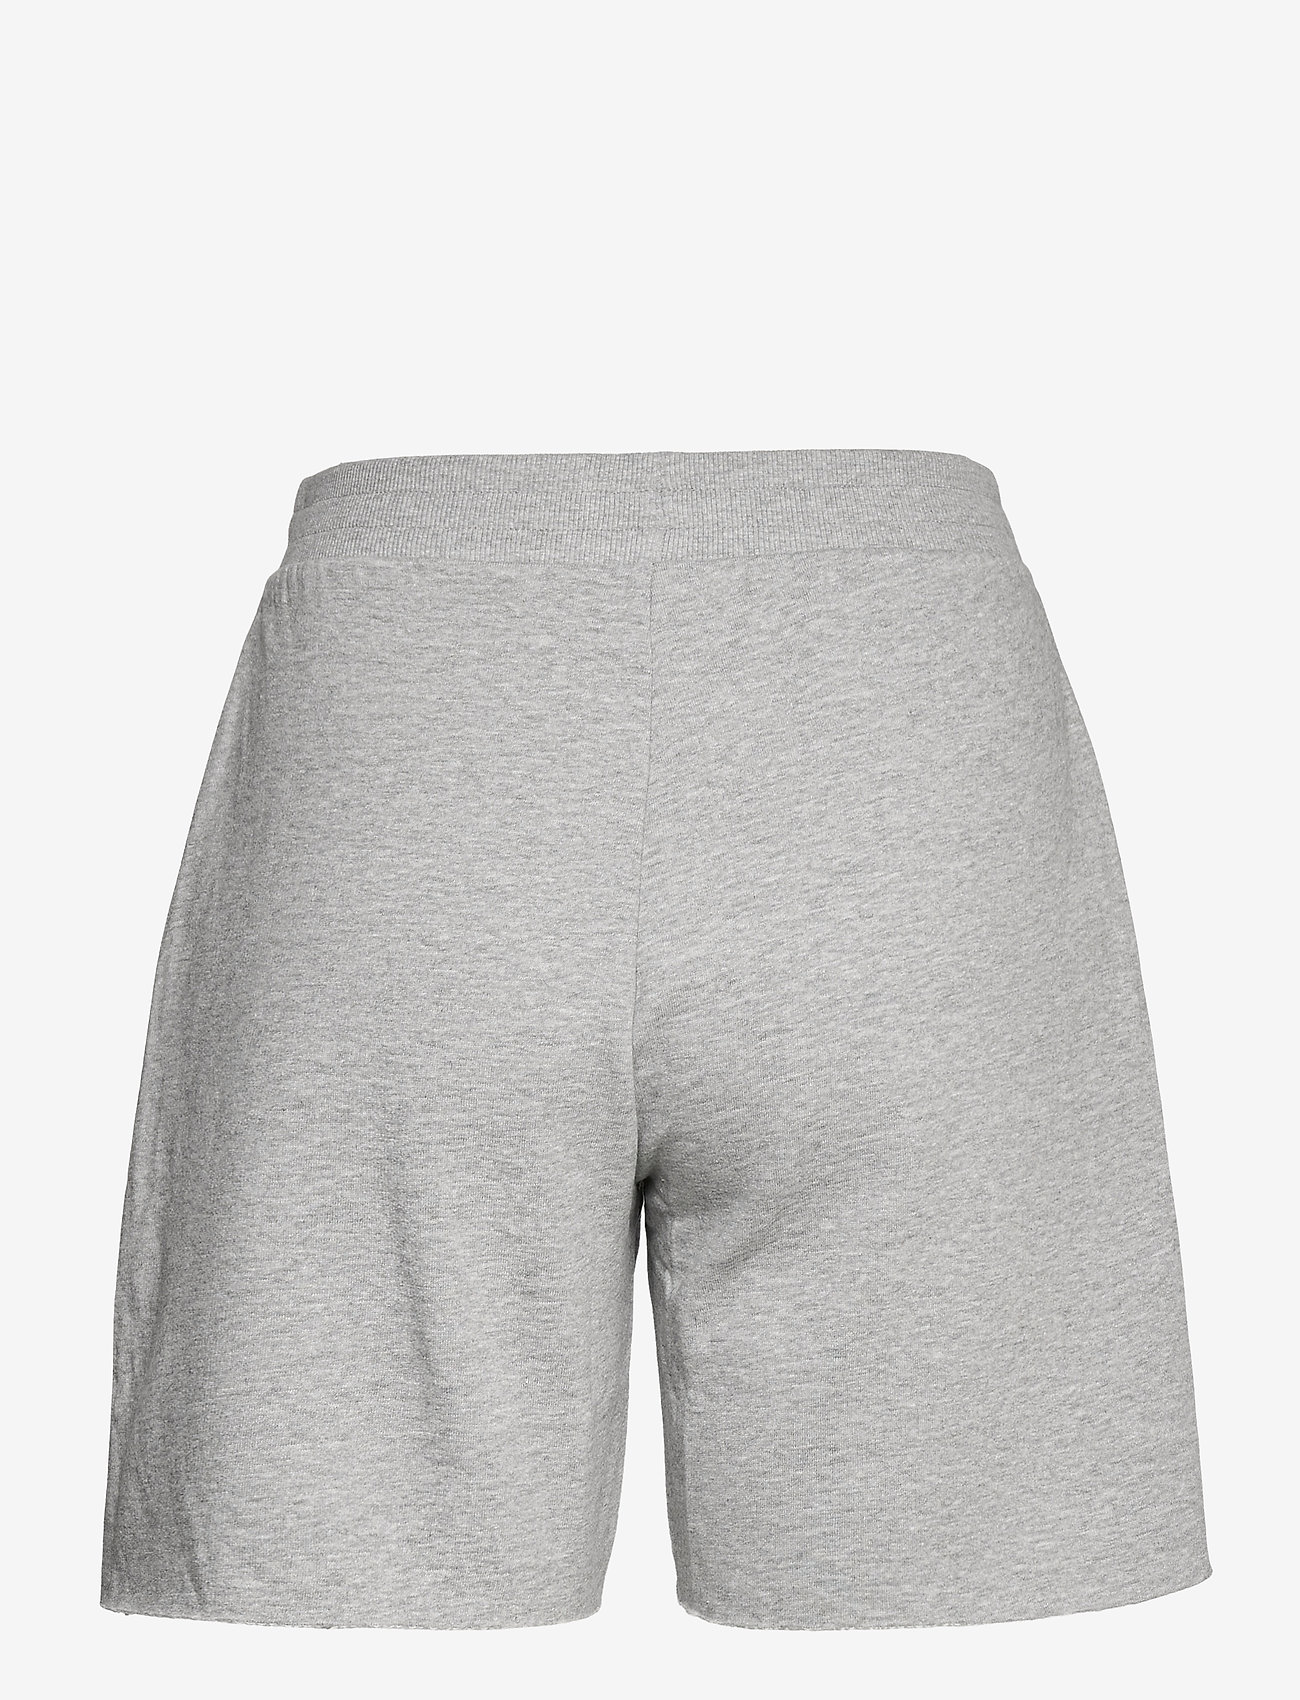 Gina Tricot - Eliana shorts - shorts casual - grey melange (8181) - 1